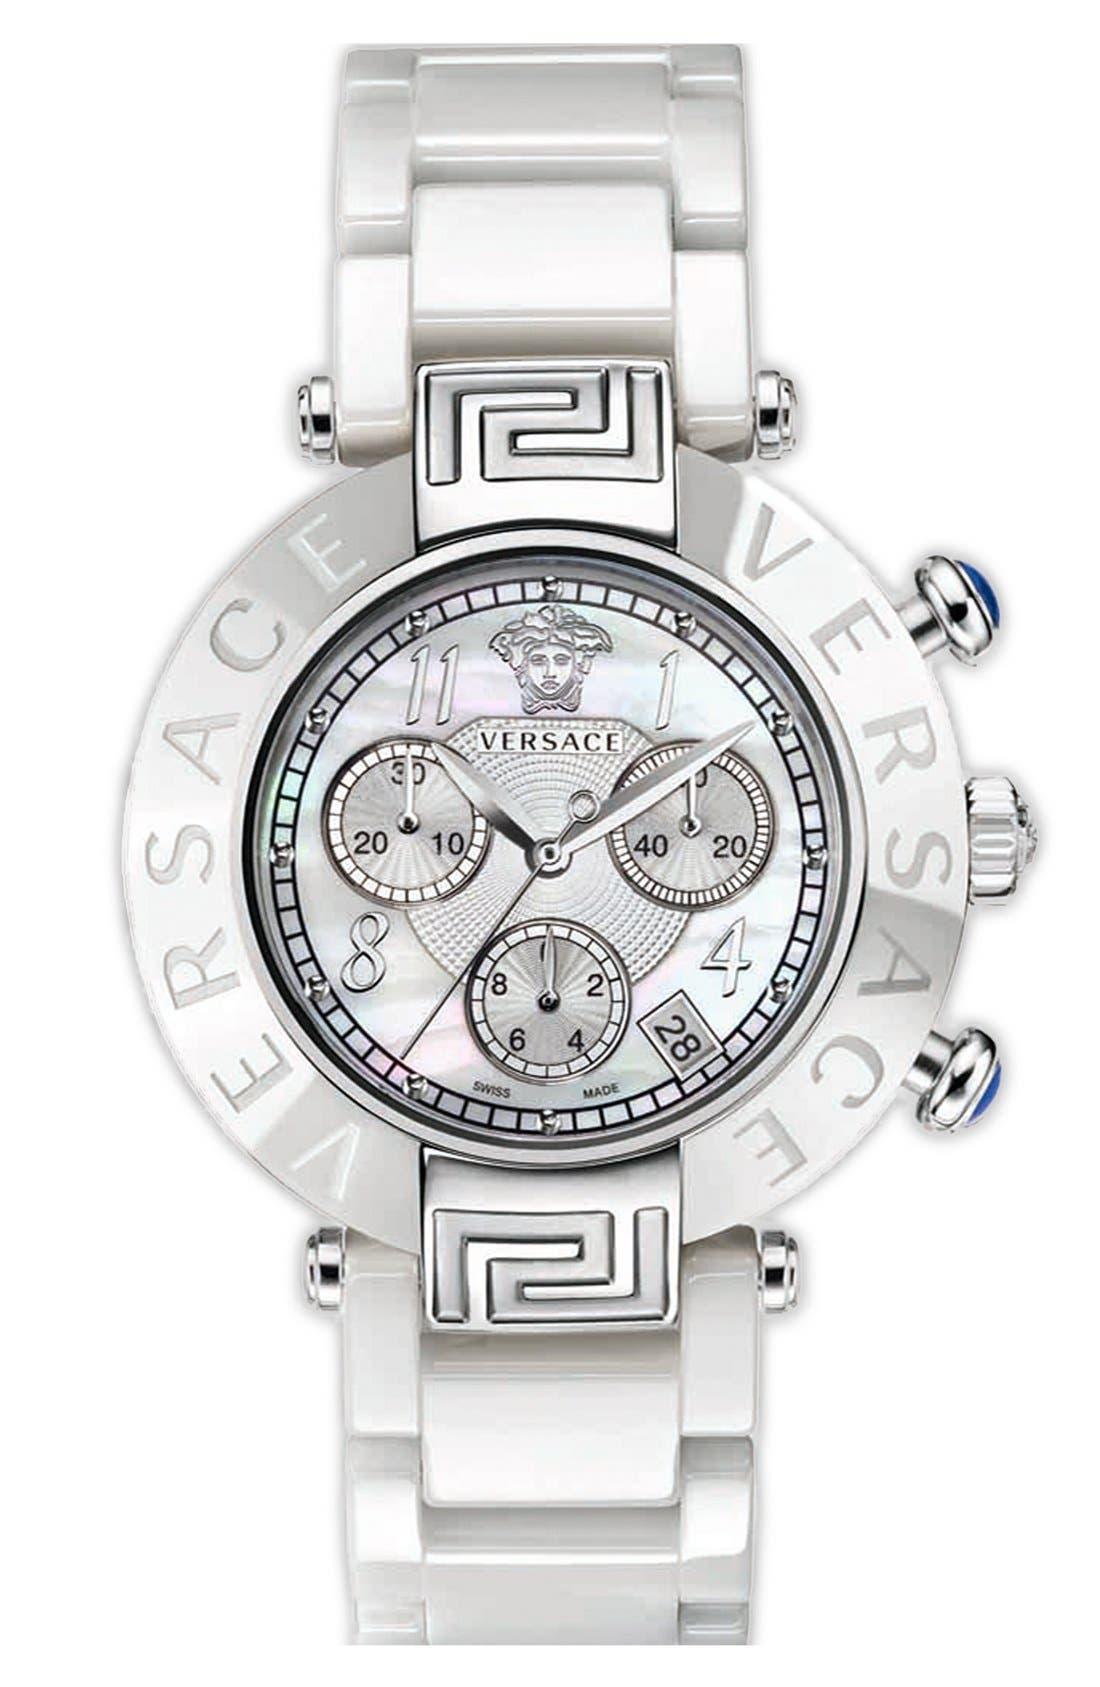 Alternate Image 1 Selected - Versace 'Reve Chrono' Ceramic Bracelet Watch, 40mm